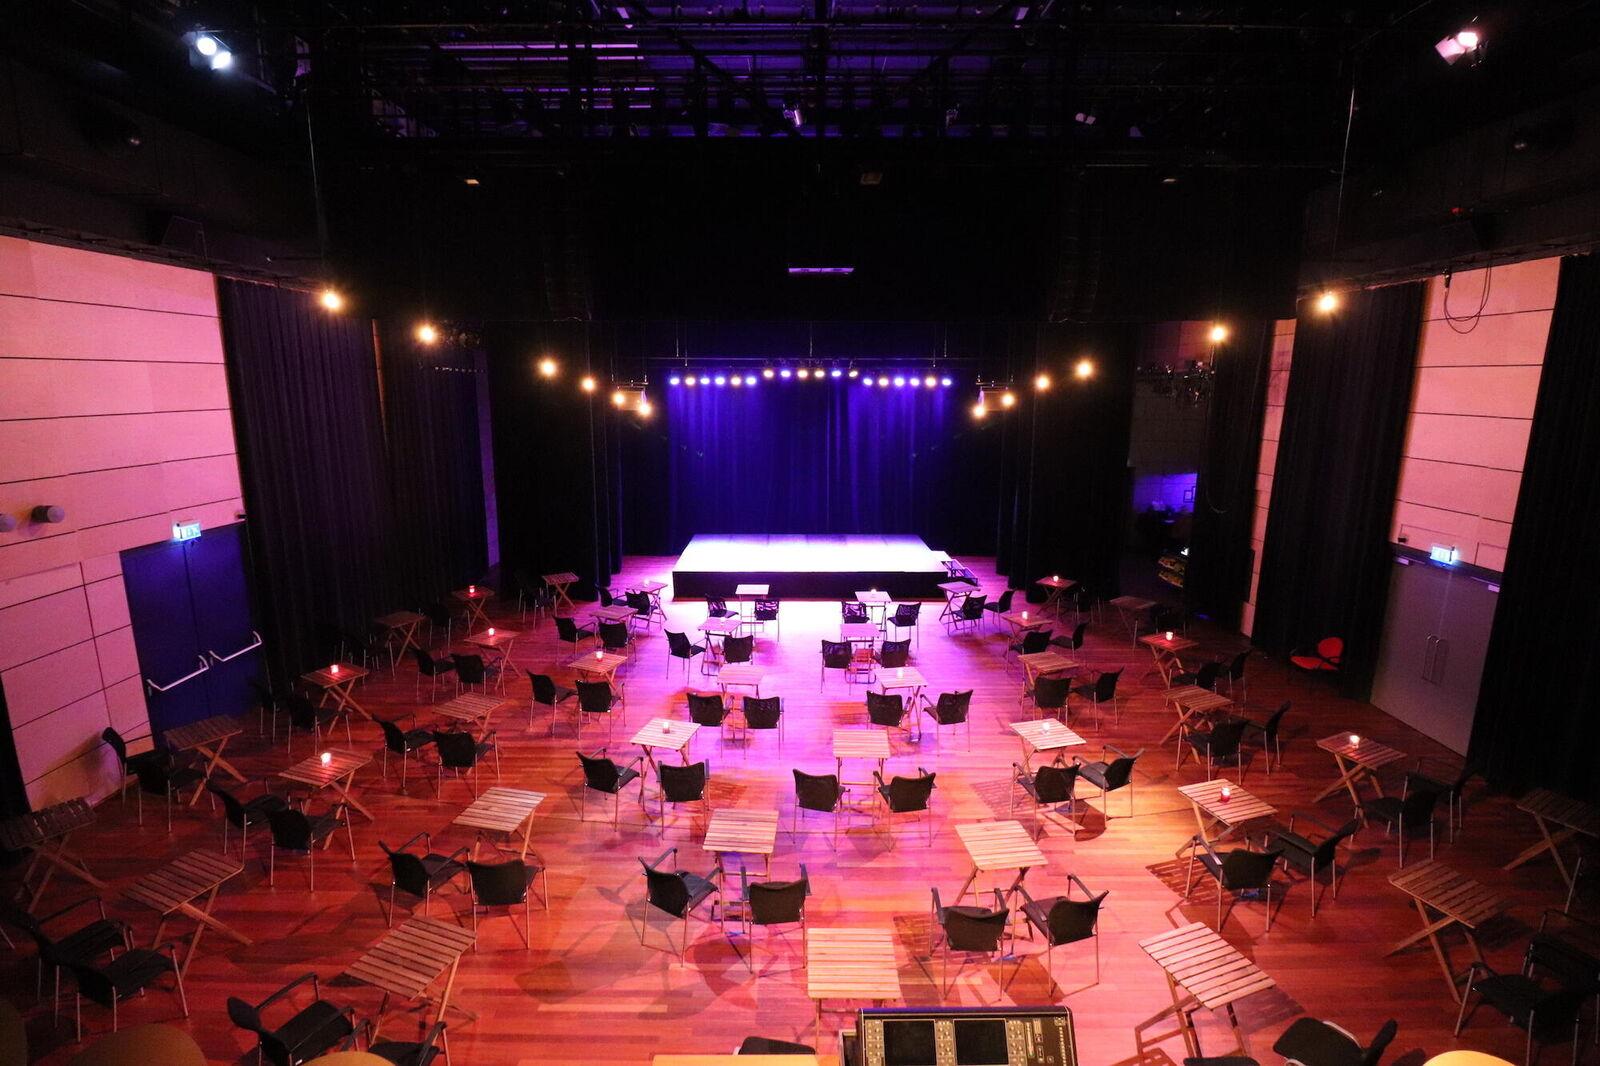 Gezellige setting in Theaterzaal met tafeltjes en stoeltjes